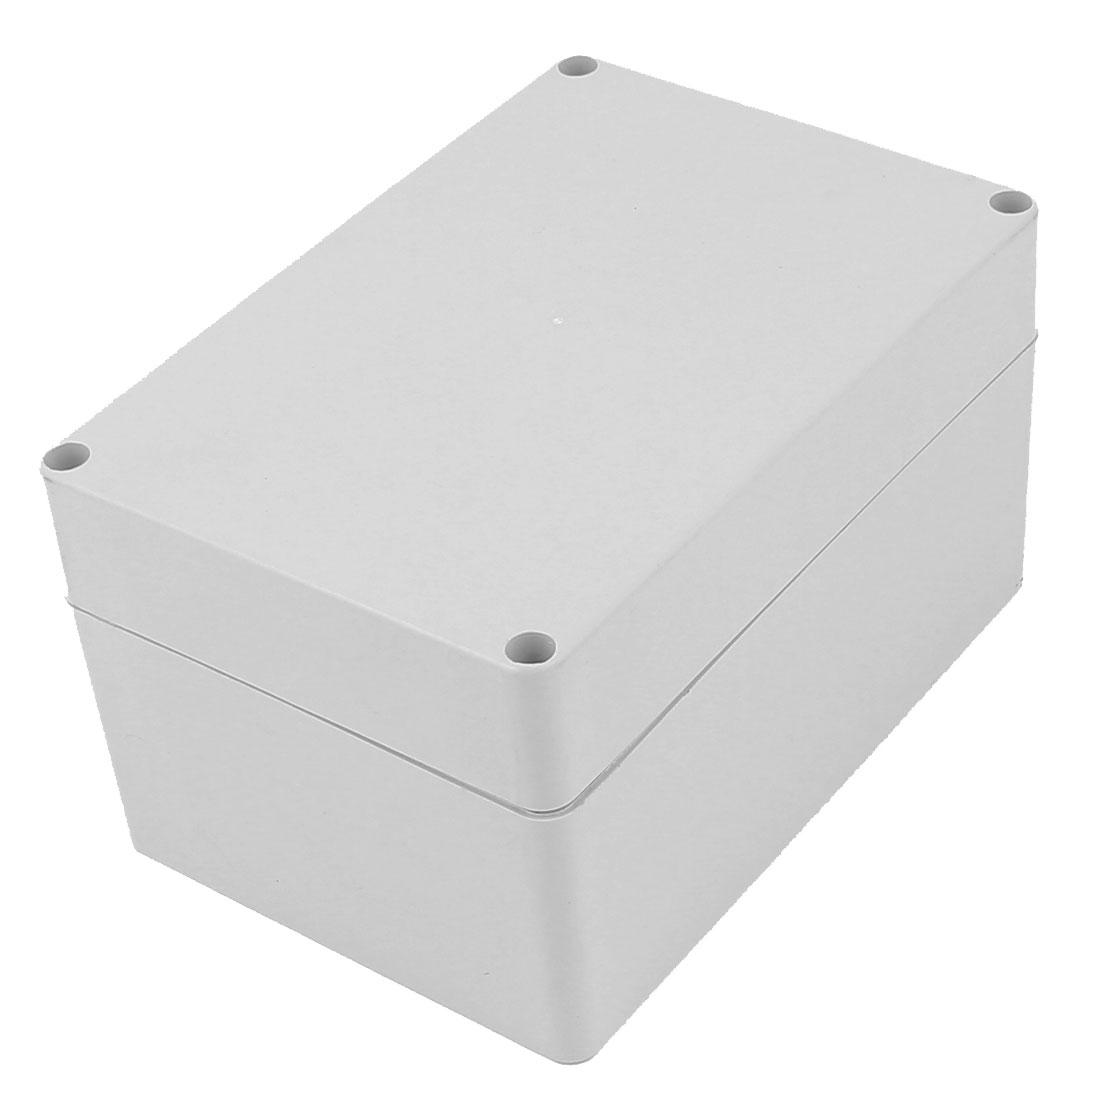 160mm x 110mm x 90mm Rectangular Dustproof IP65 Plastic DIY Junction Box Case